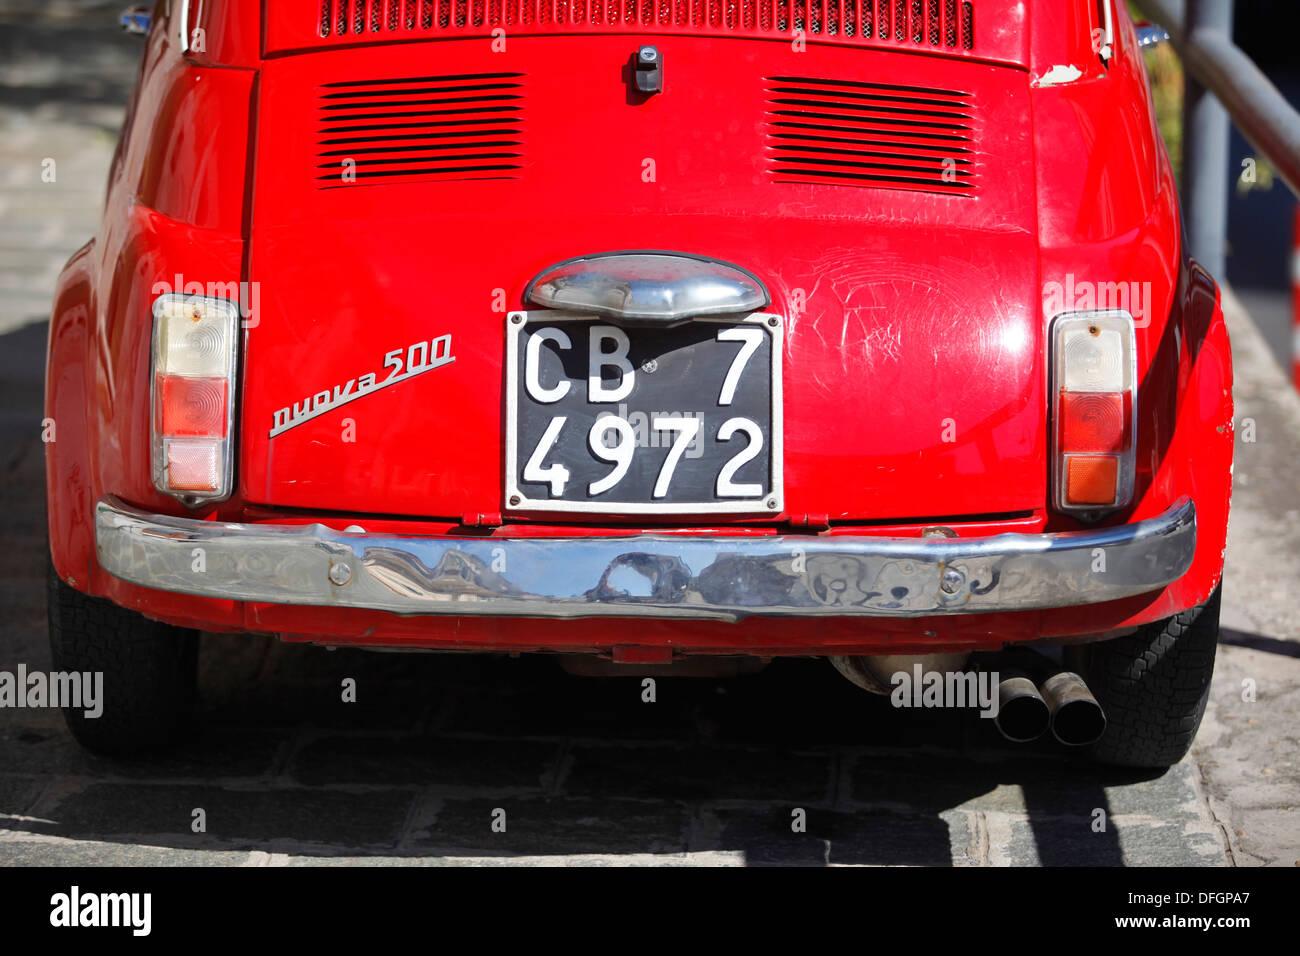 A red Fiat 500 Cinquecento. - Stock Image